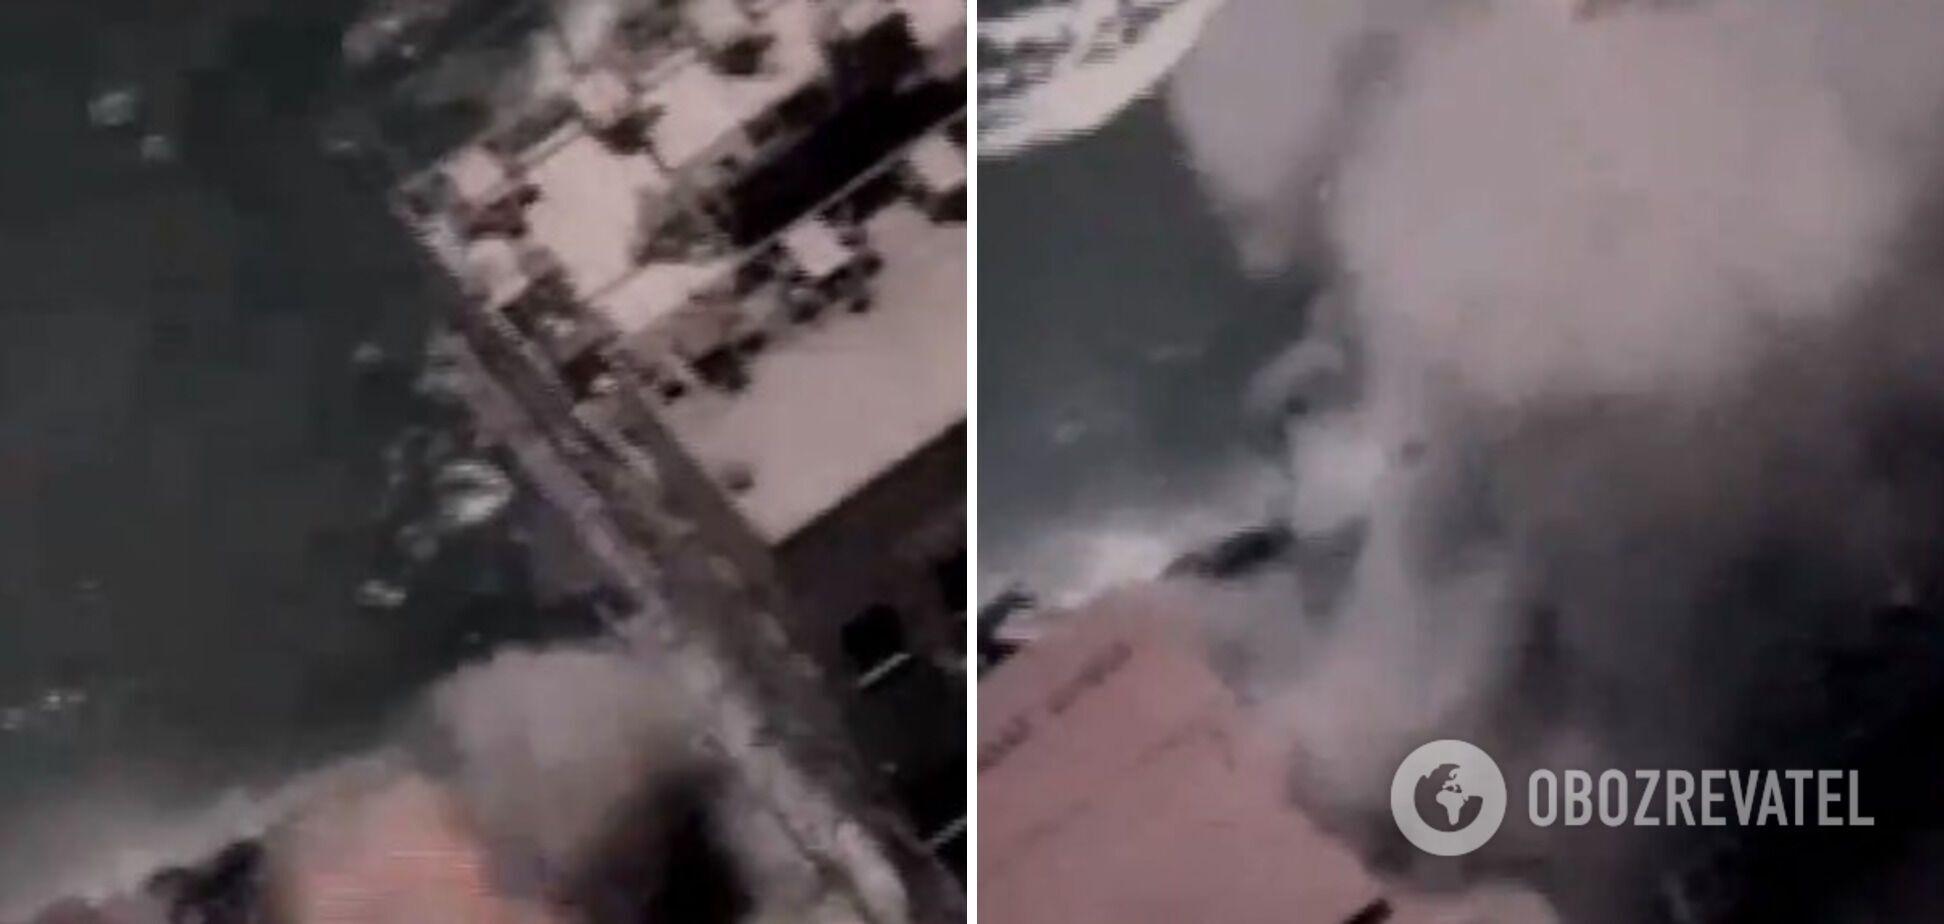 ВМС и БПЛА Израиля нанесли удар по субмарине ХАМАС